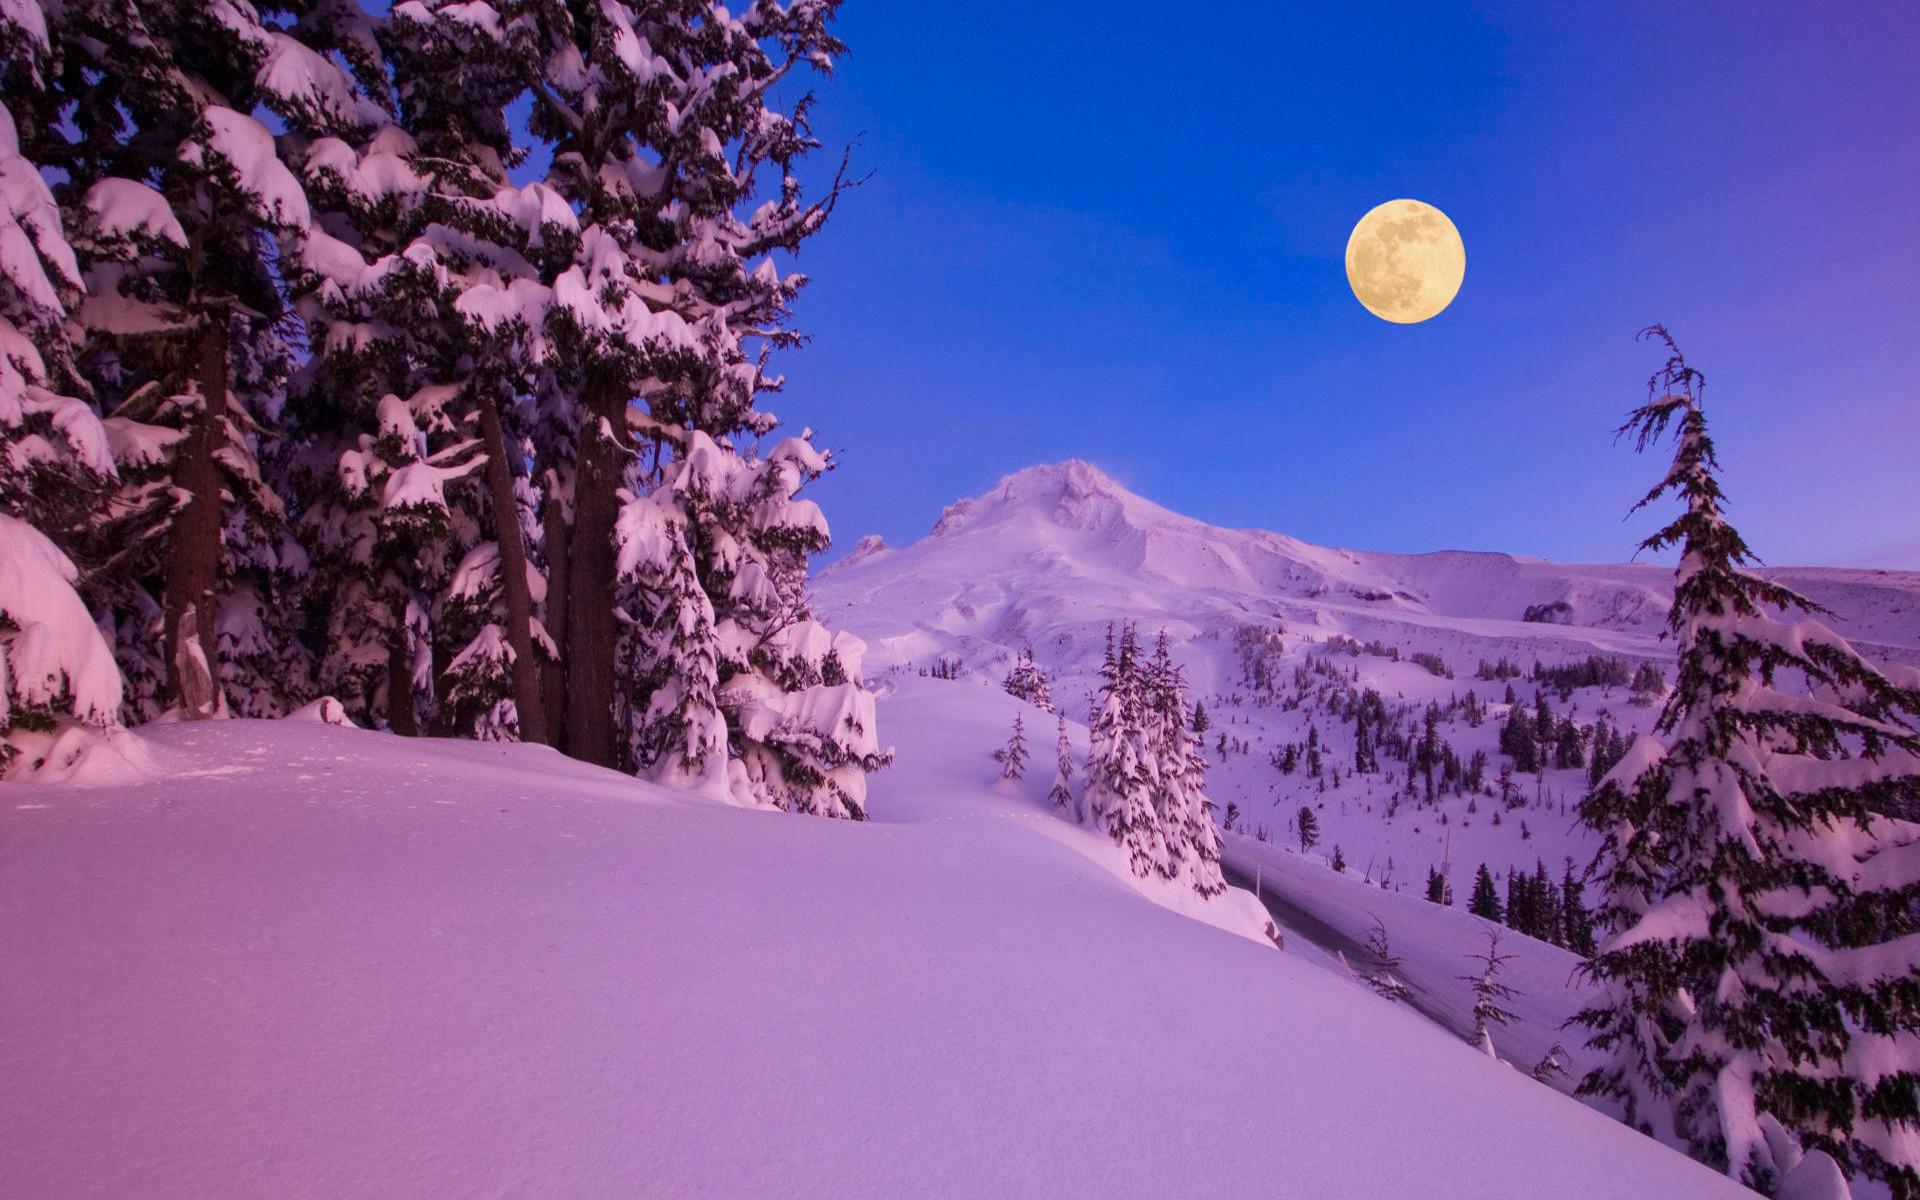 Wallpaper winter, snow, night, moon, mountains, tree desktop wallpaper .